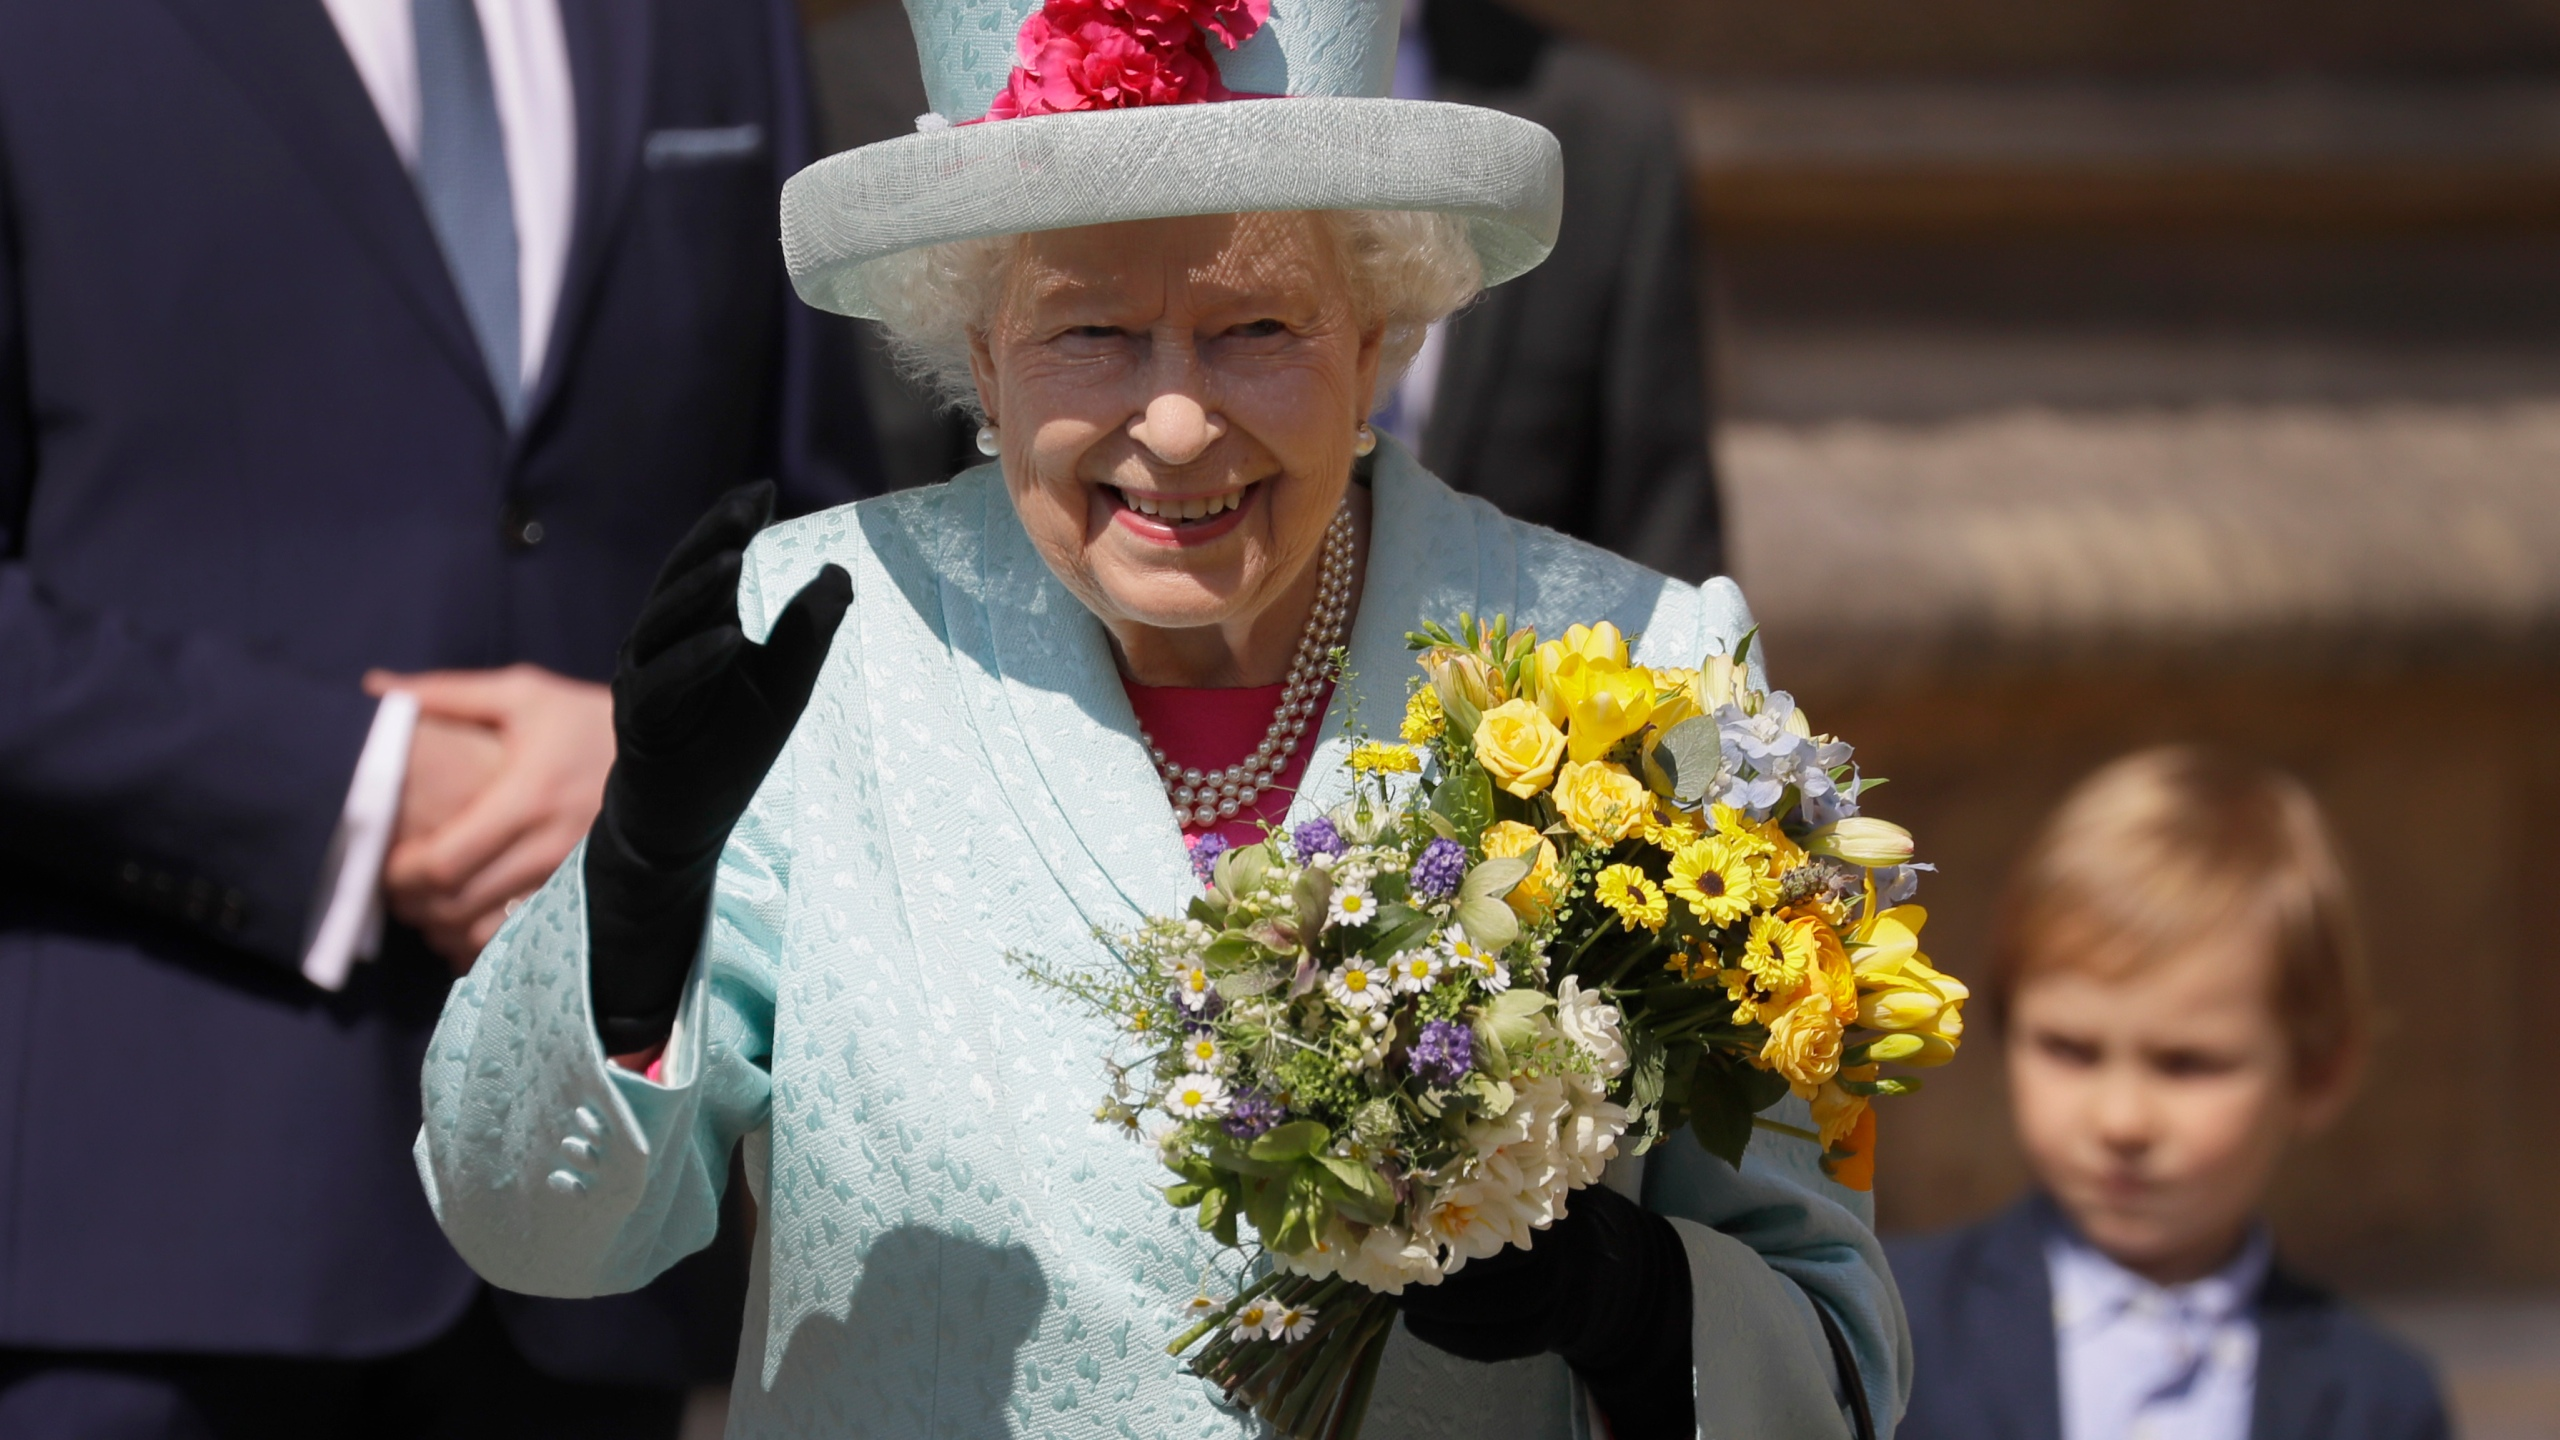 Britain_Royals_58281-159532.jpg52954673